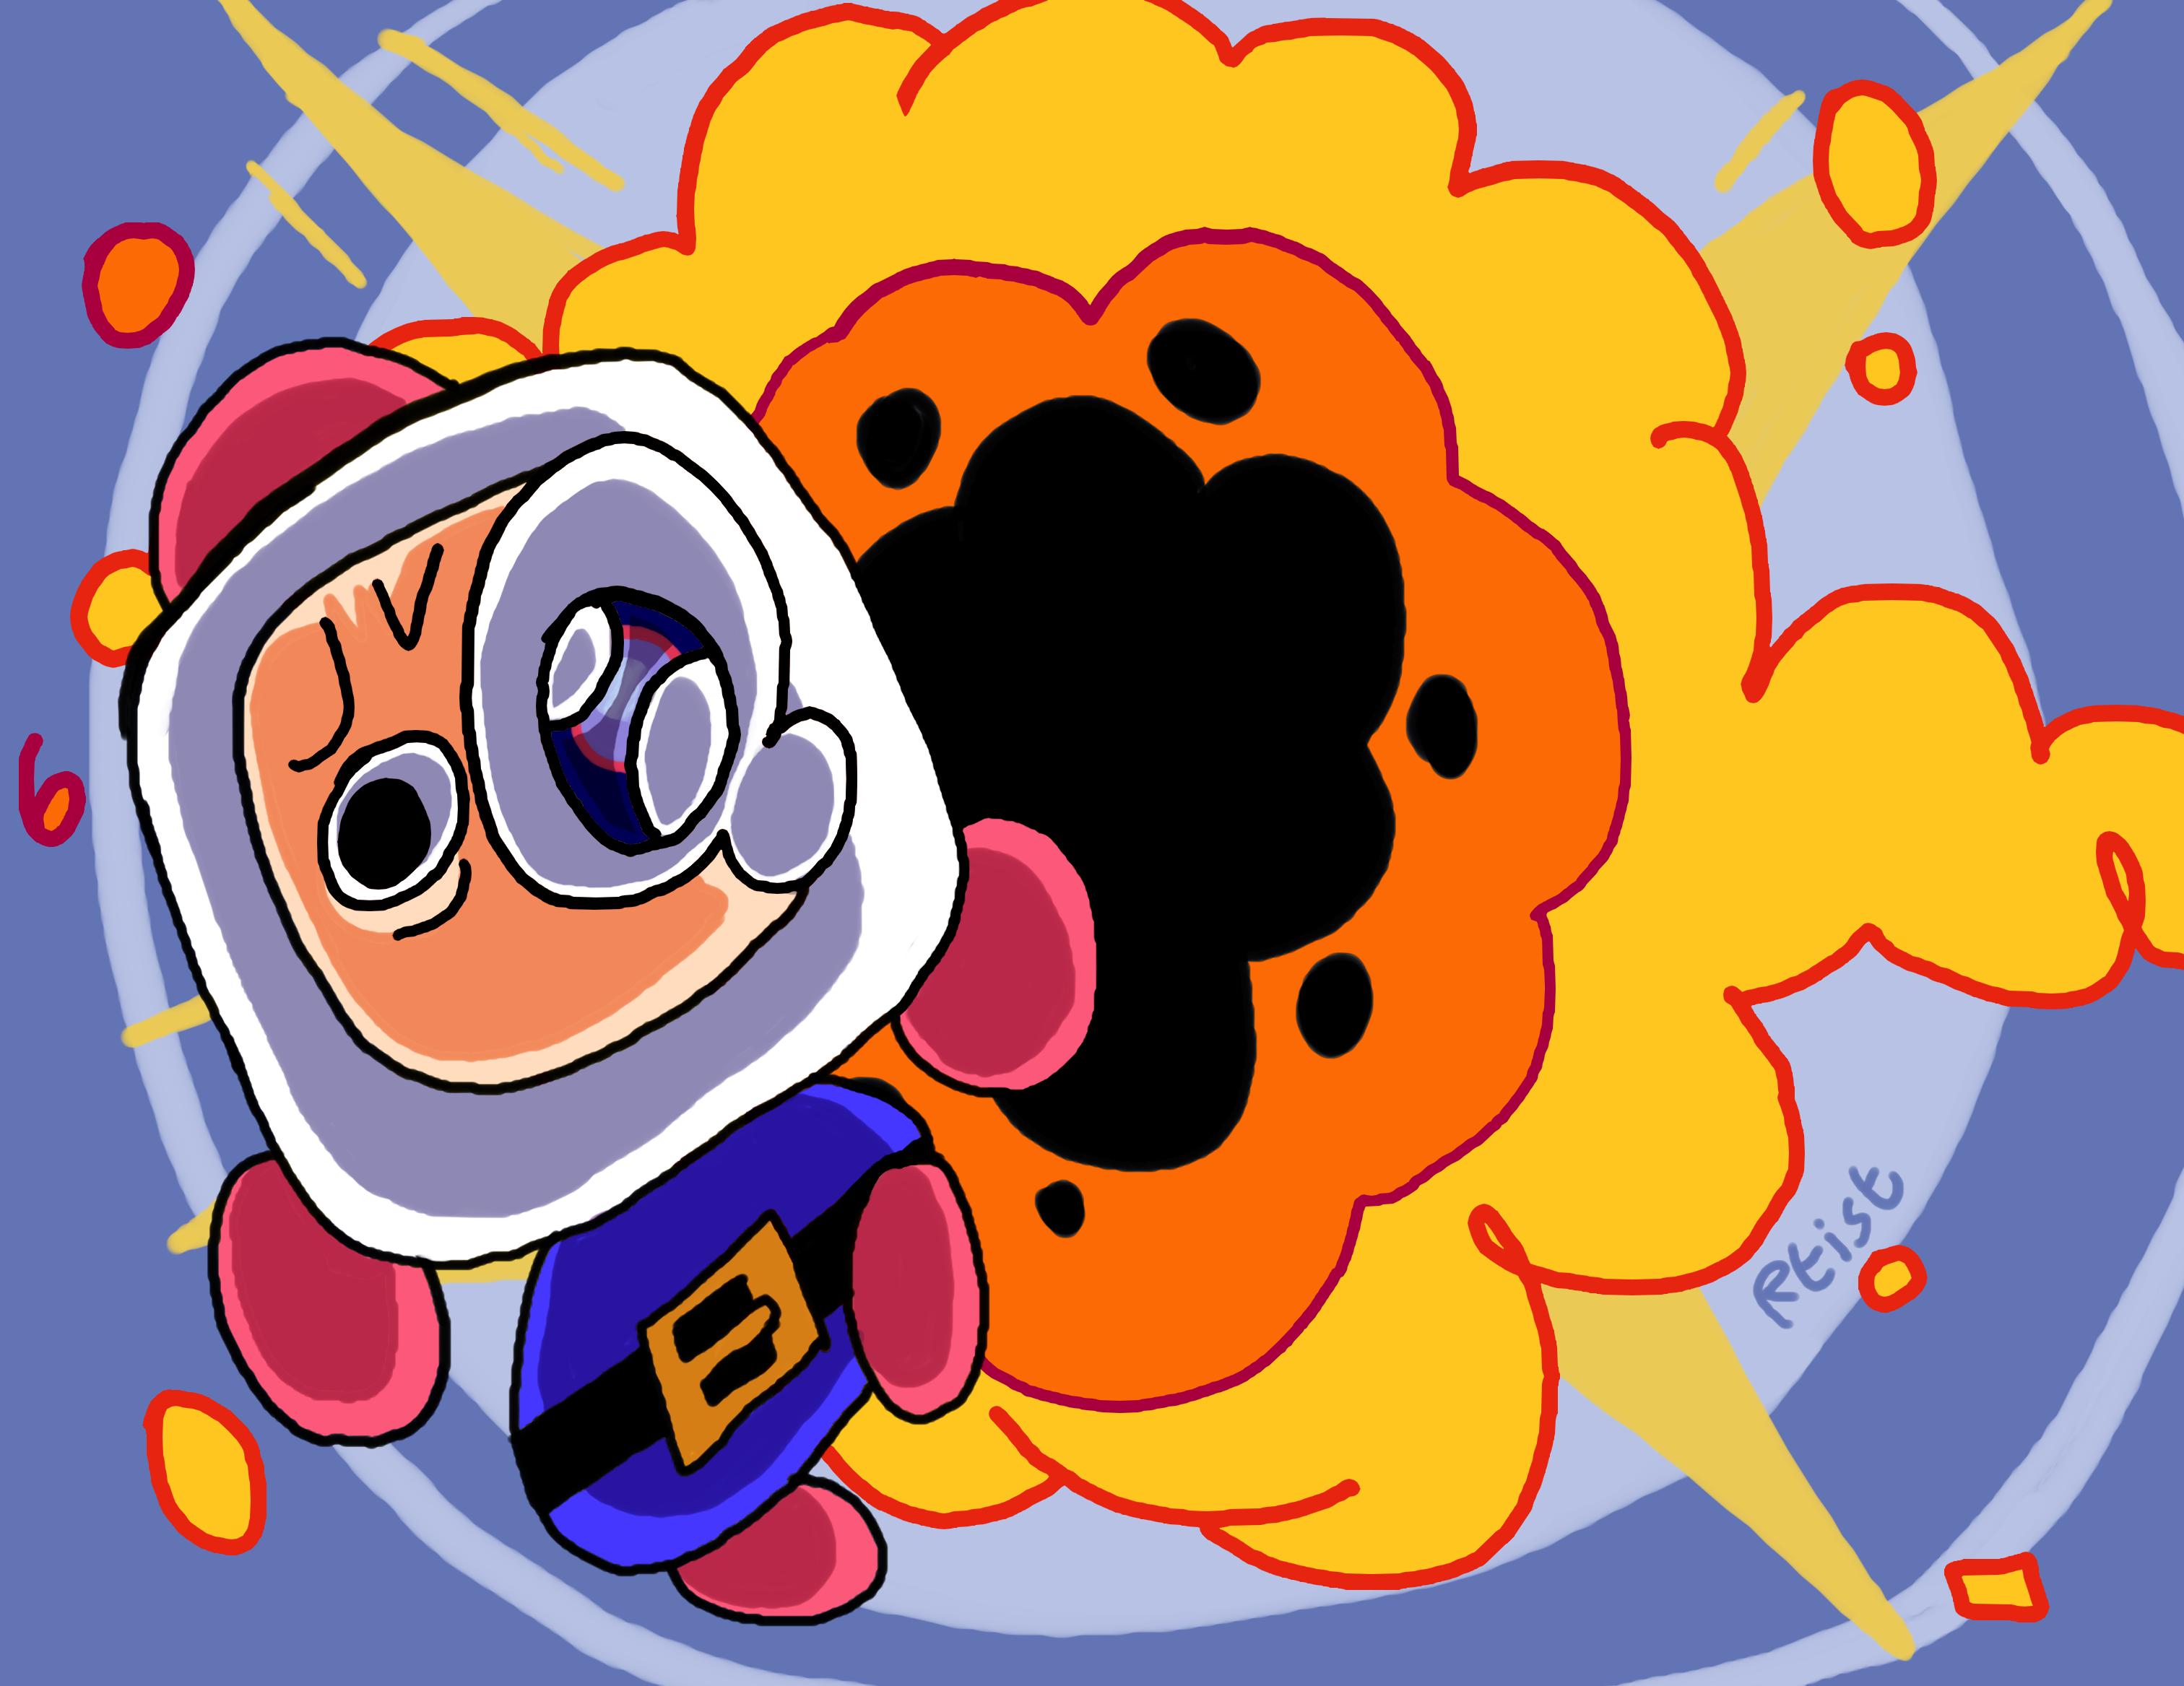 It's the bomb, man!